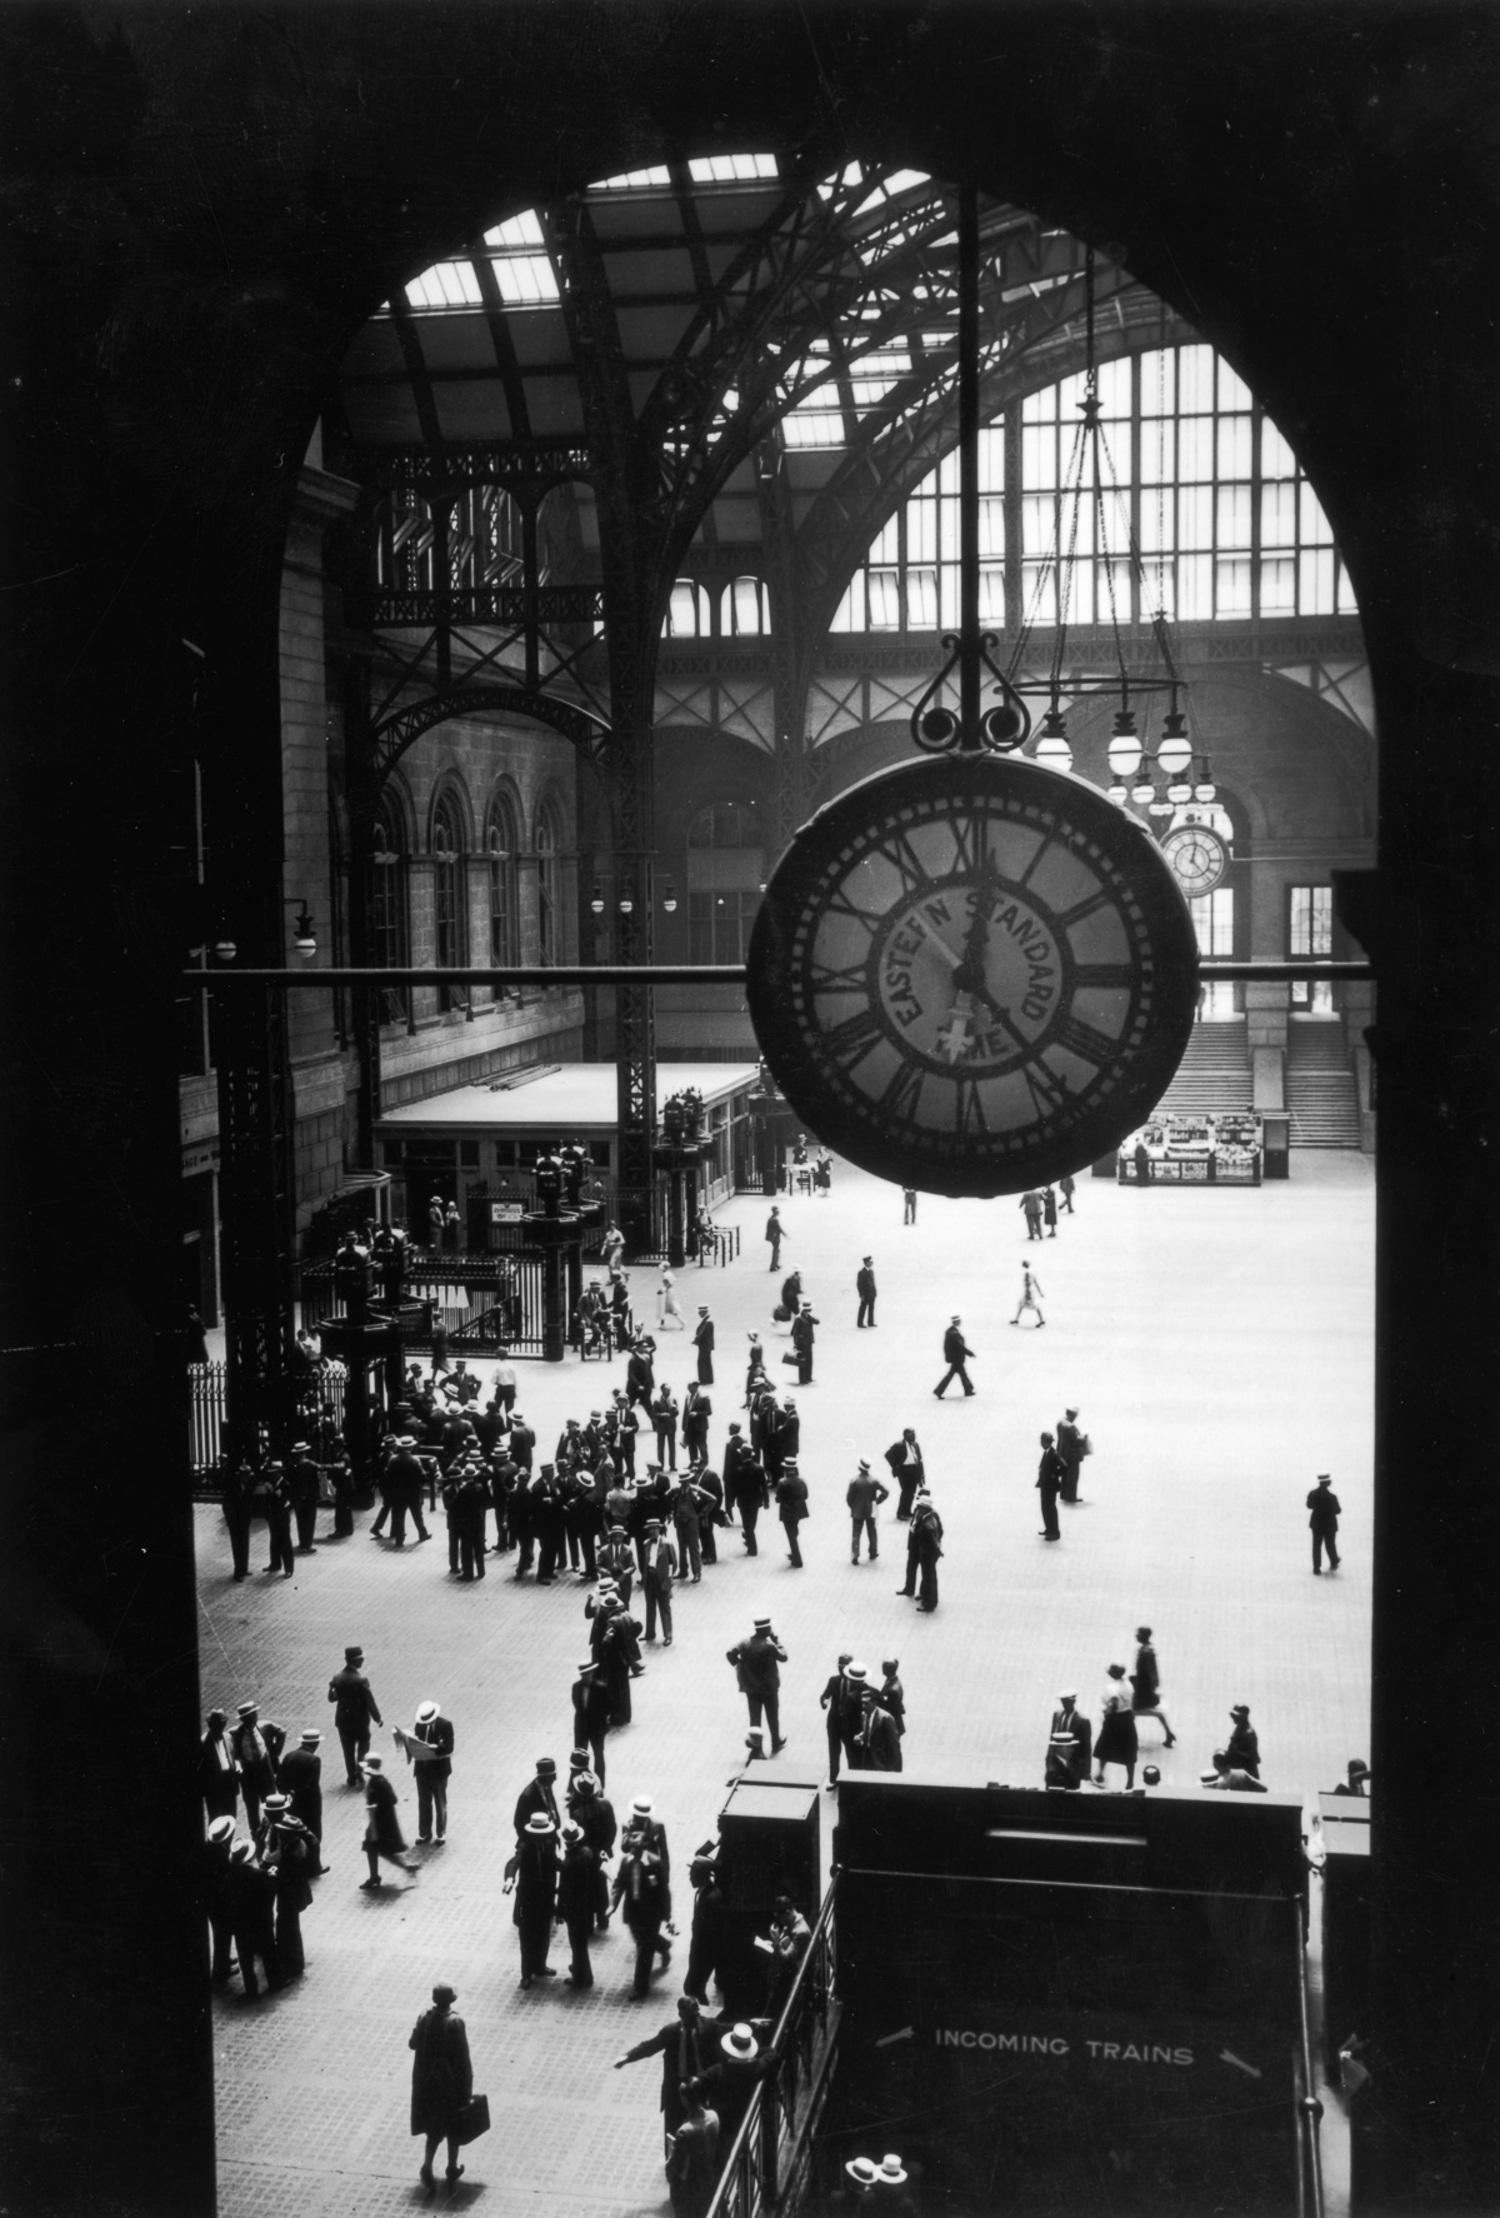 c. 1925